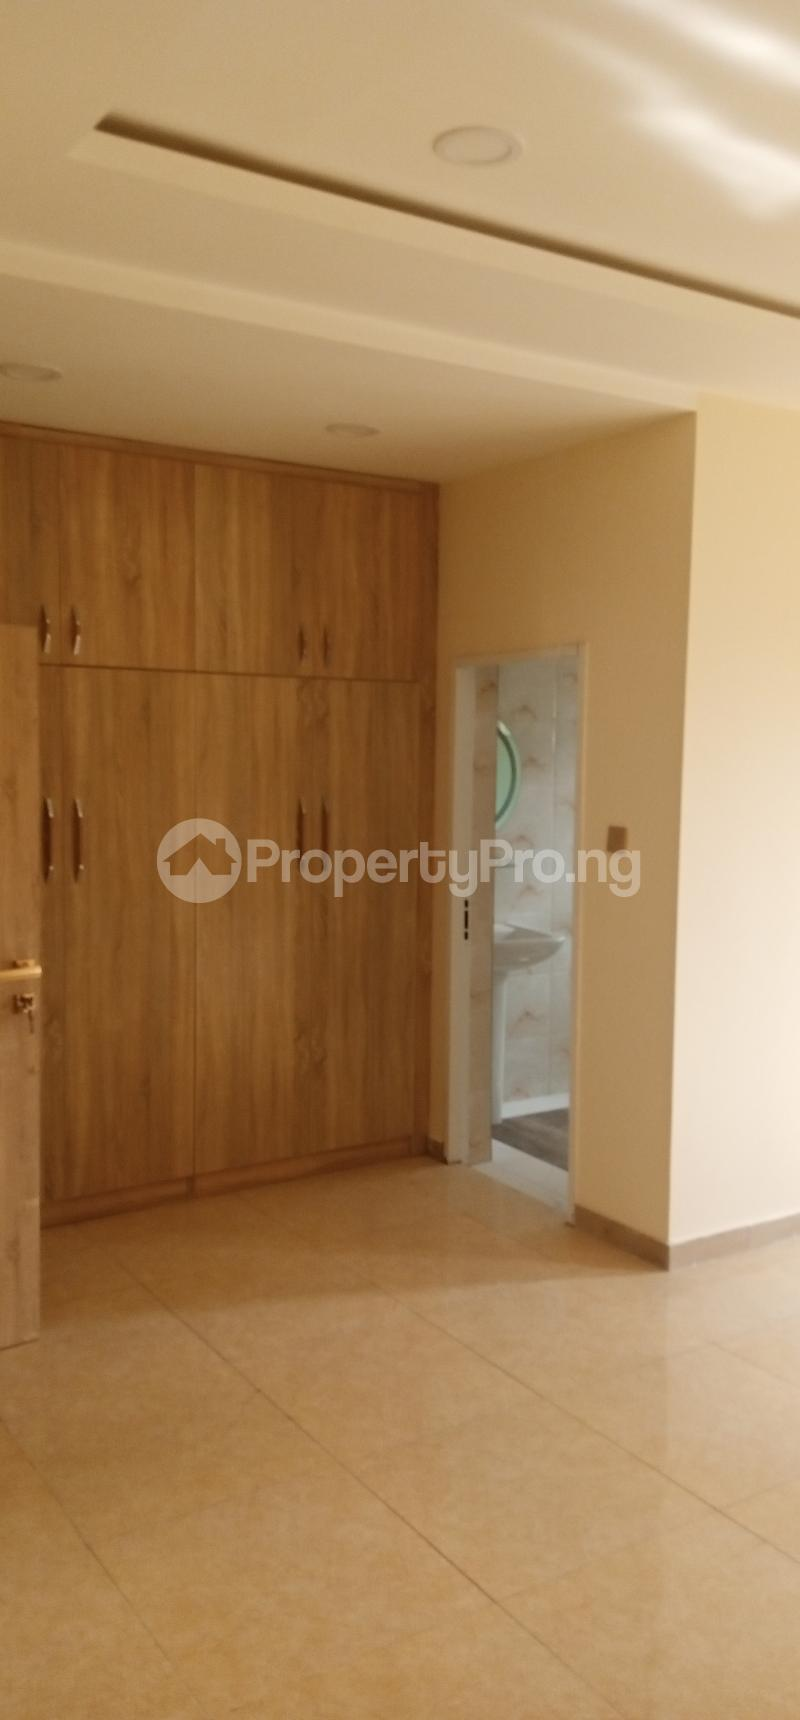 4 bedroom Terraced Duplex House for sale Wuye Abuja - 3